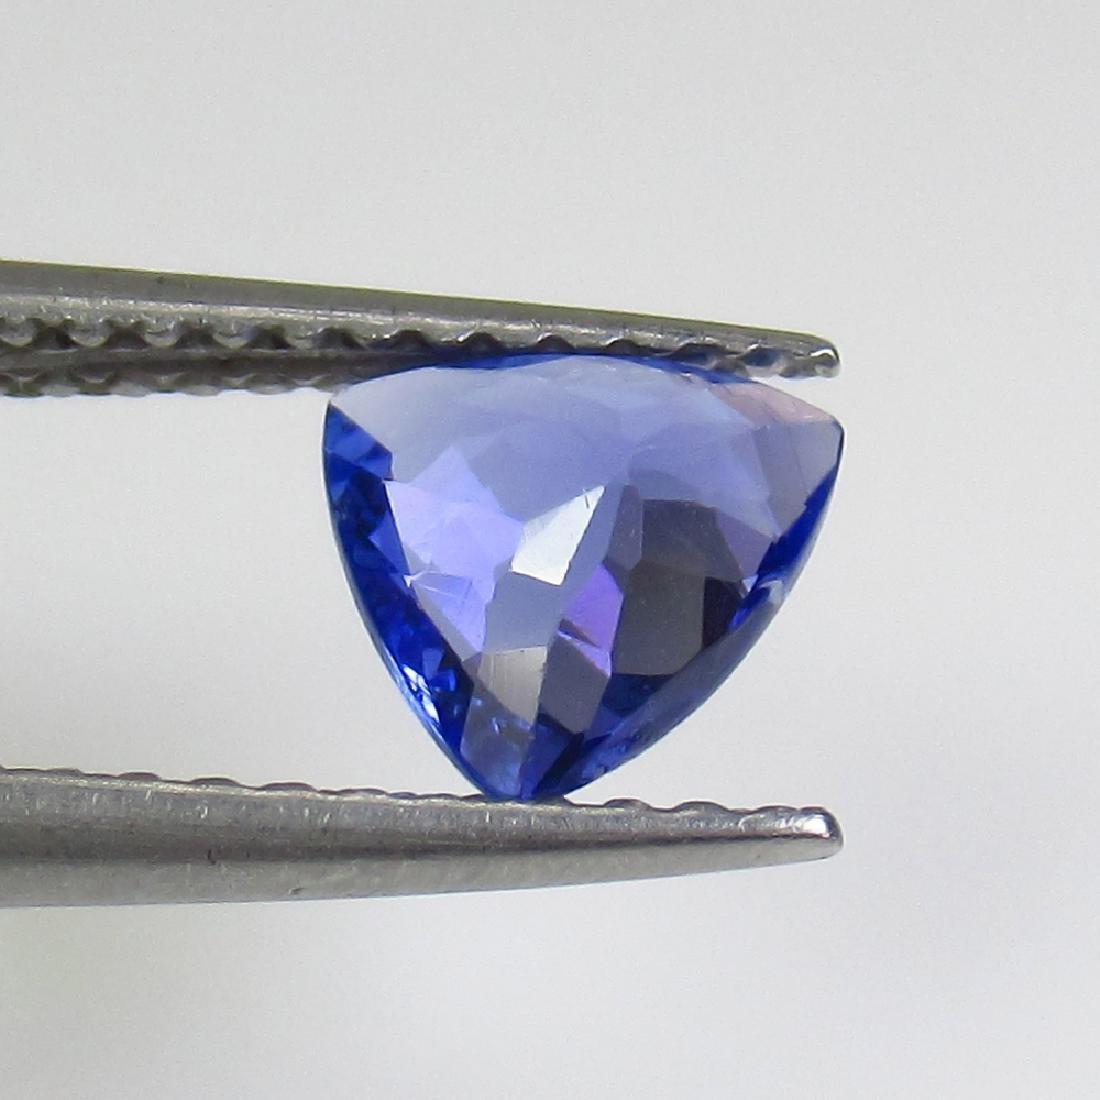 0.67 Ct Genuine Tanzanite 6X6 mm Excellent Trillion Cut - 2